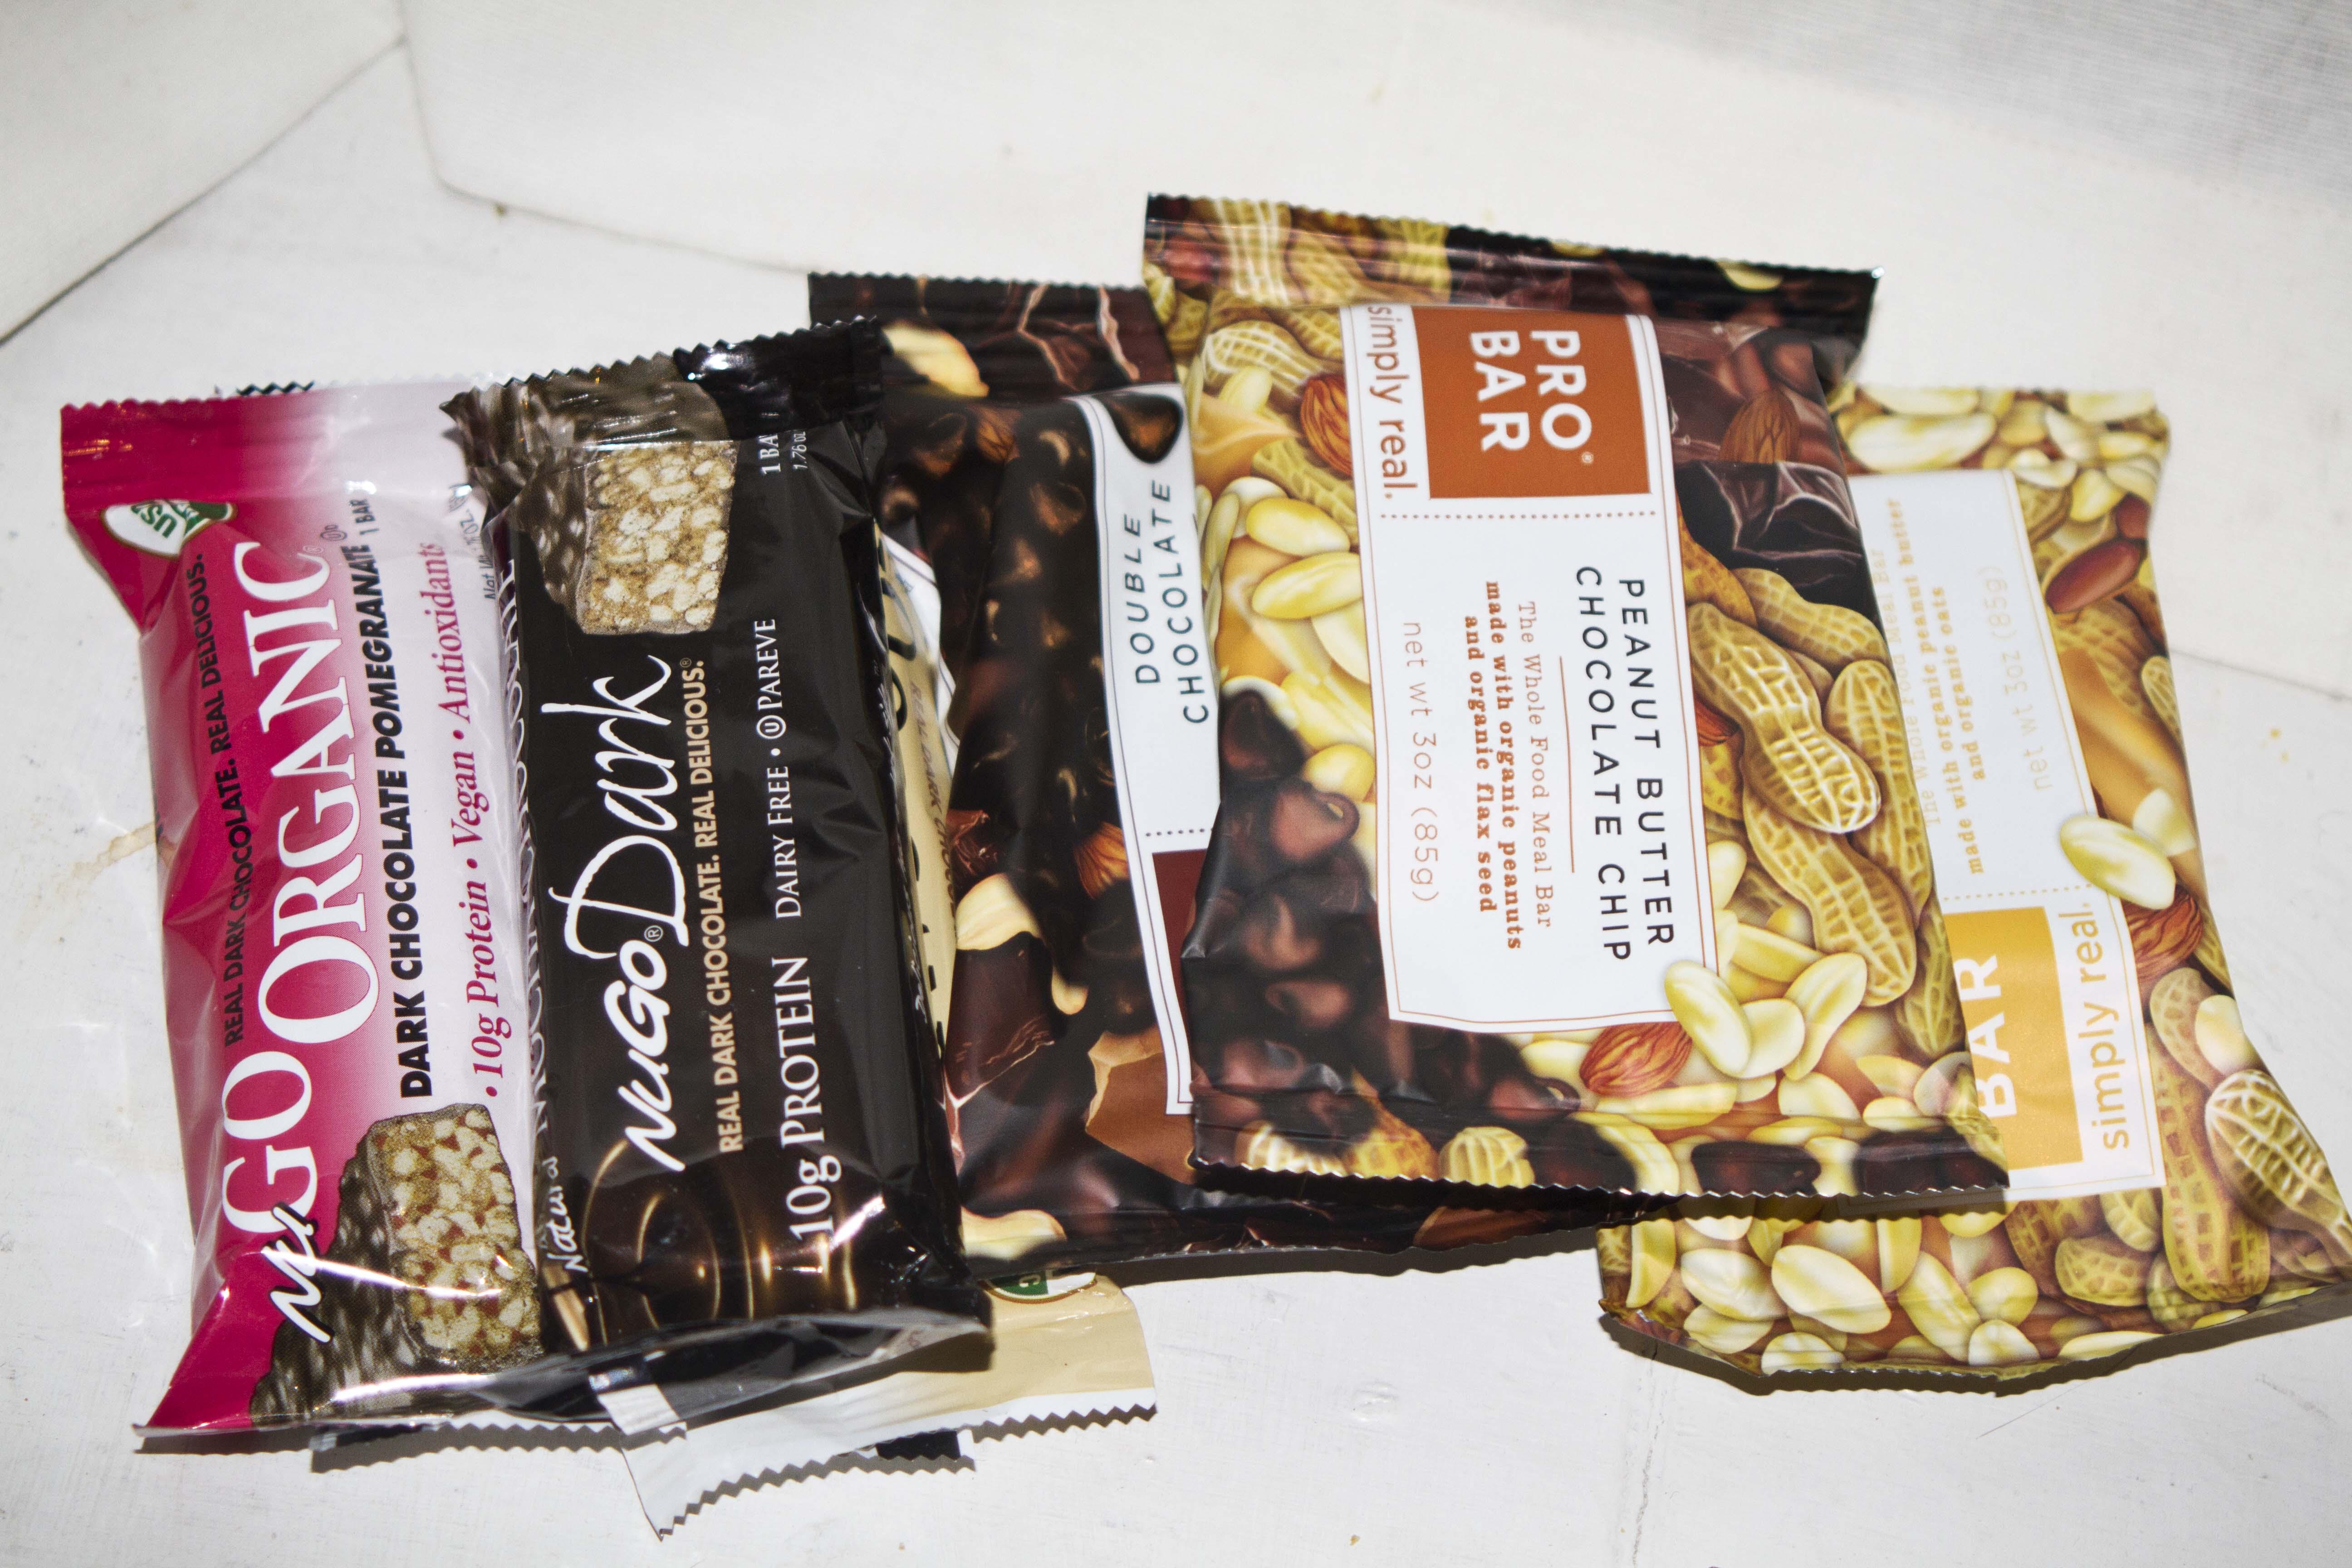 Vegan granola brands